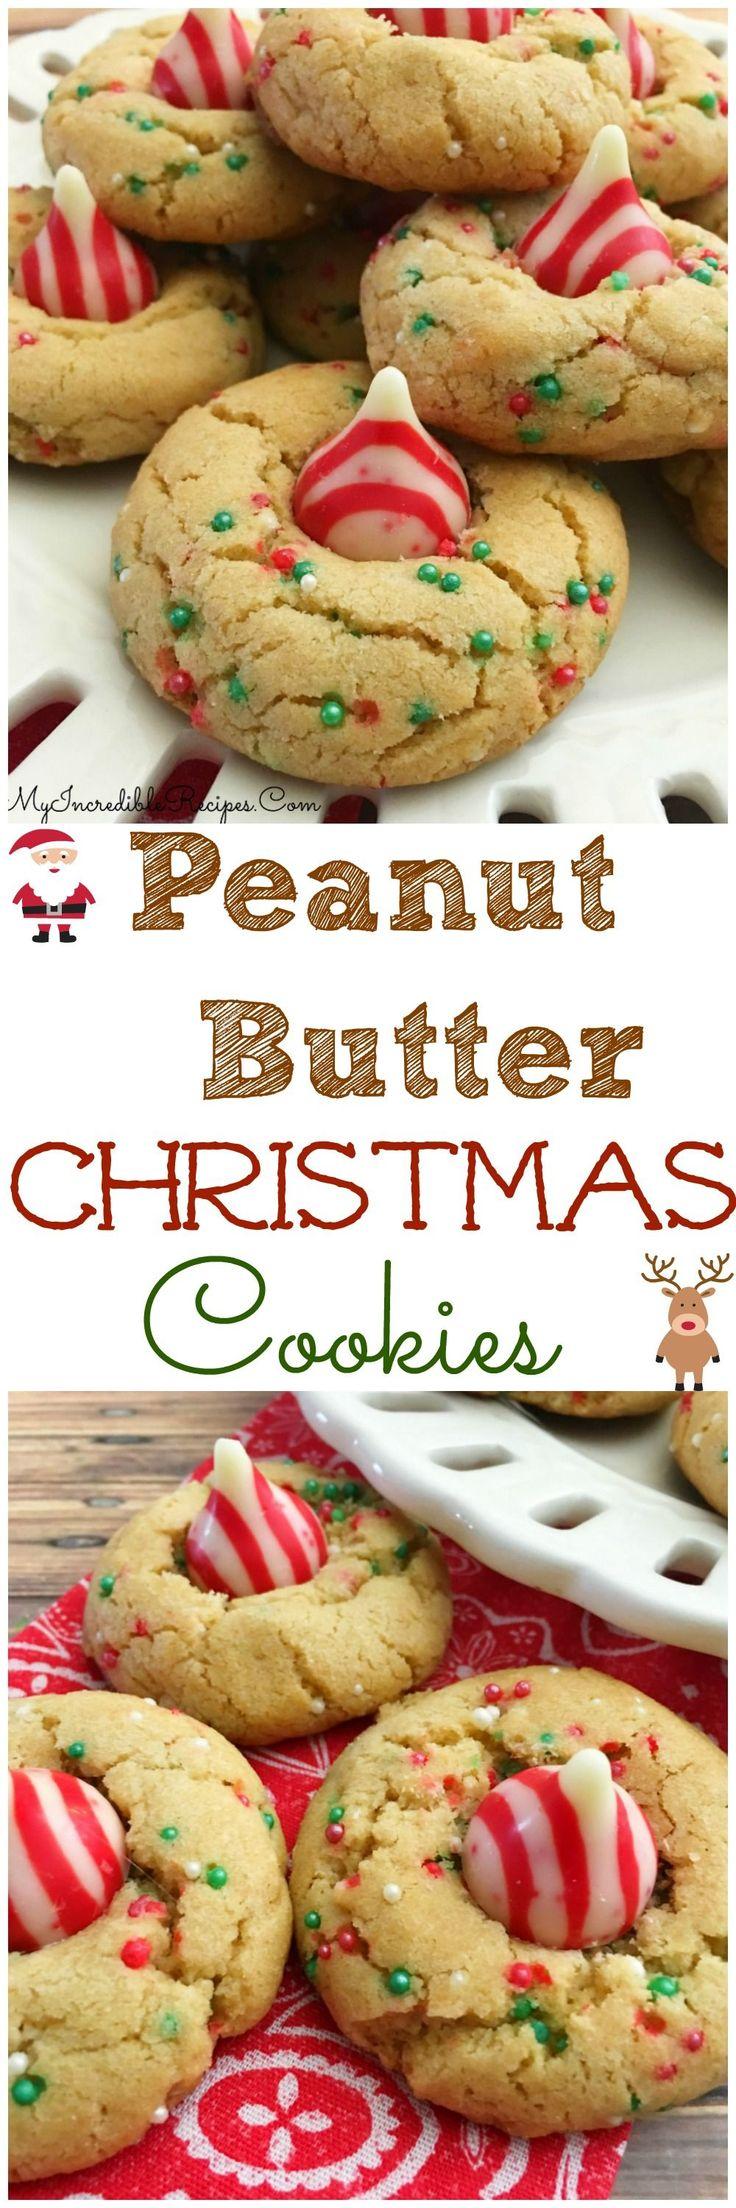 Peanut Butter Christmas Cookies!